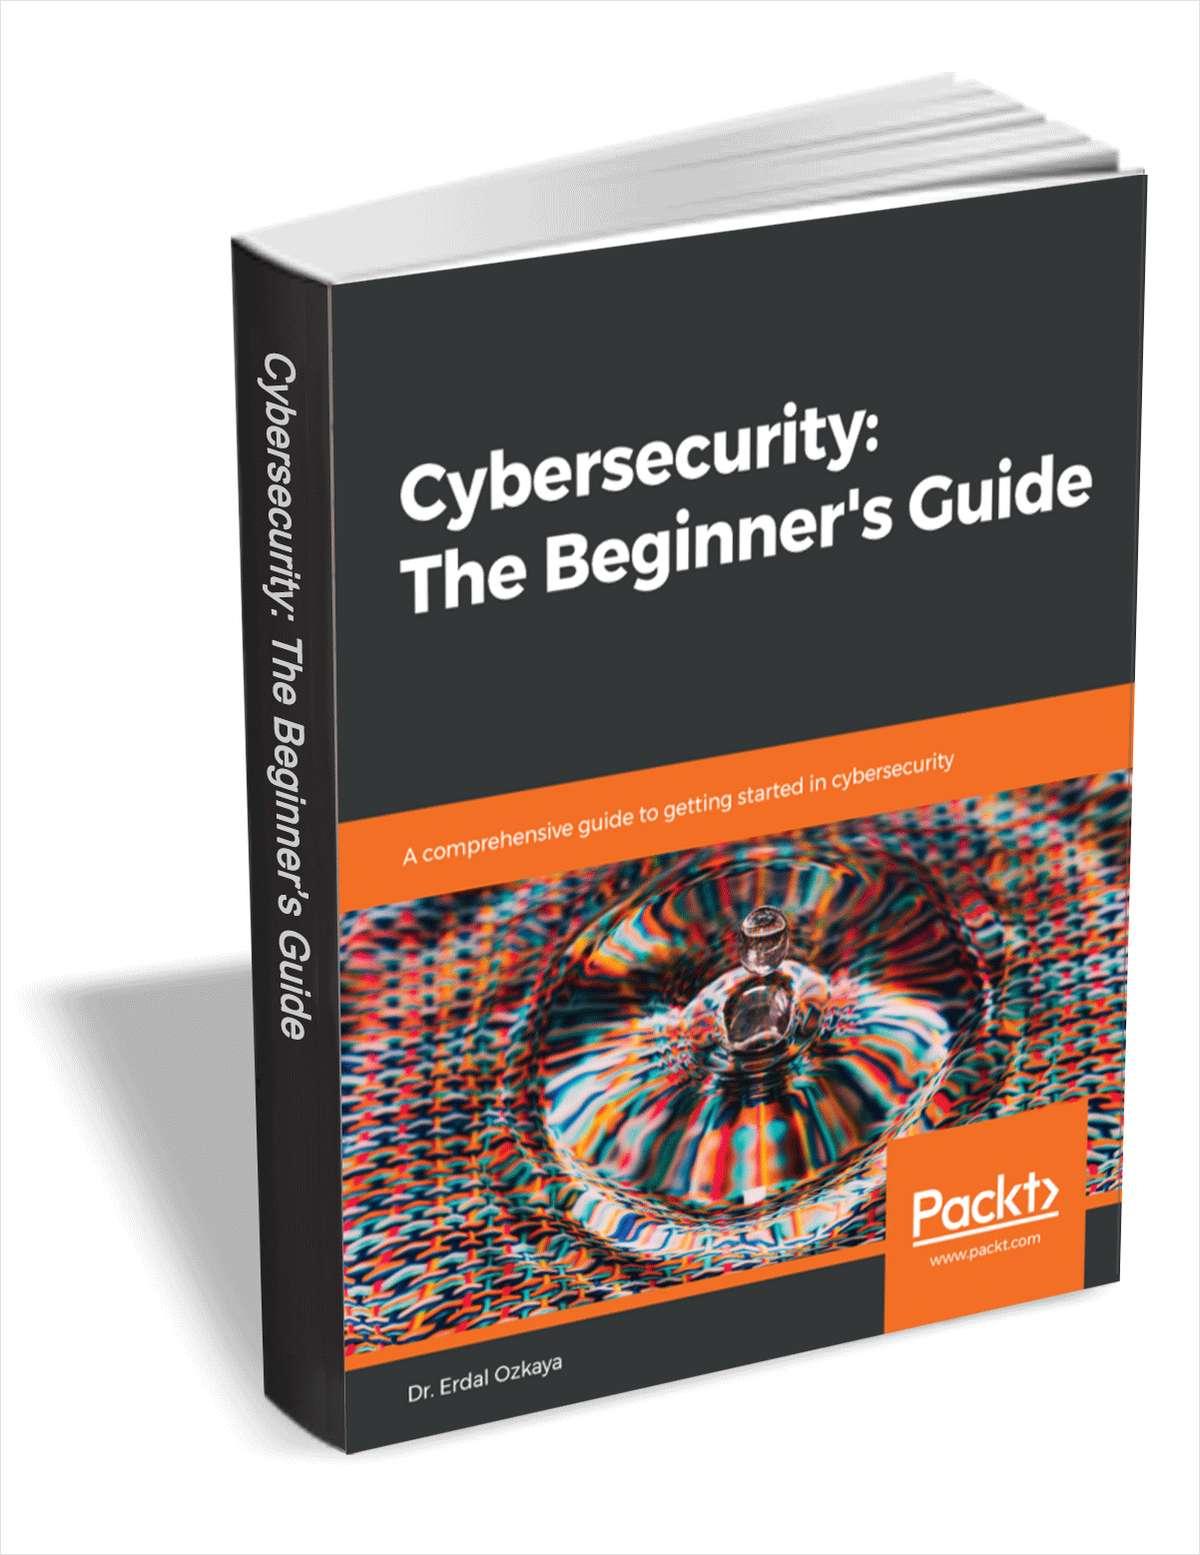 eBook Cybersecurity : The Beginner's Guide (Anglais - Dématérialisé)